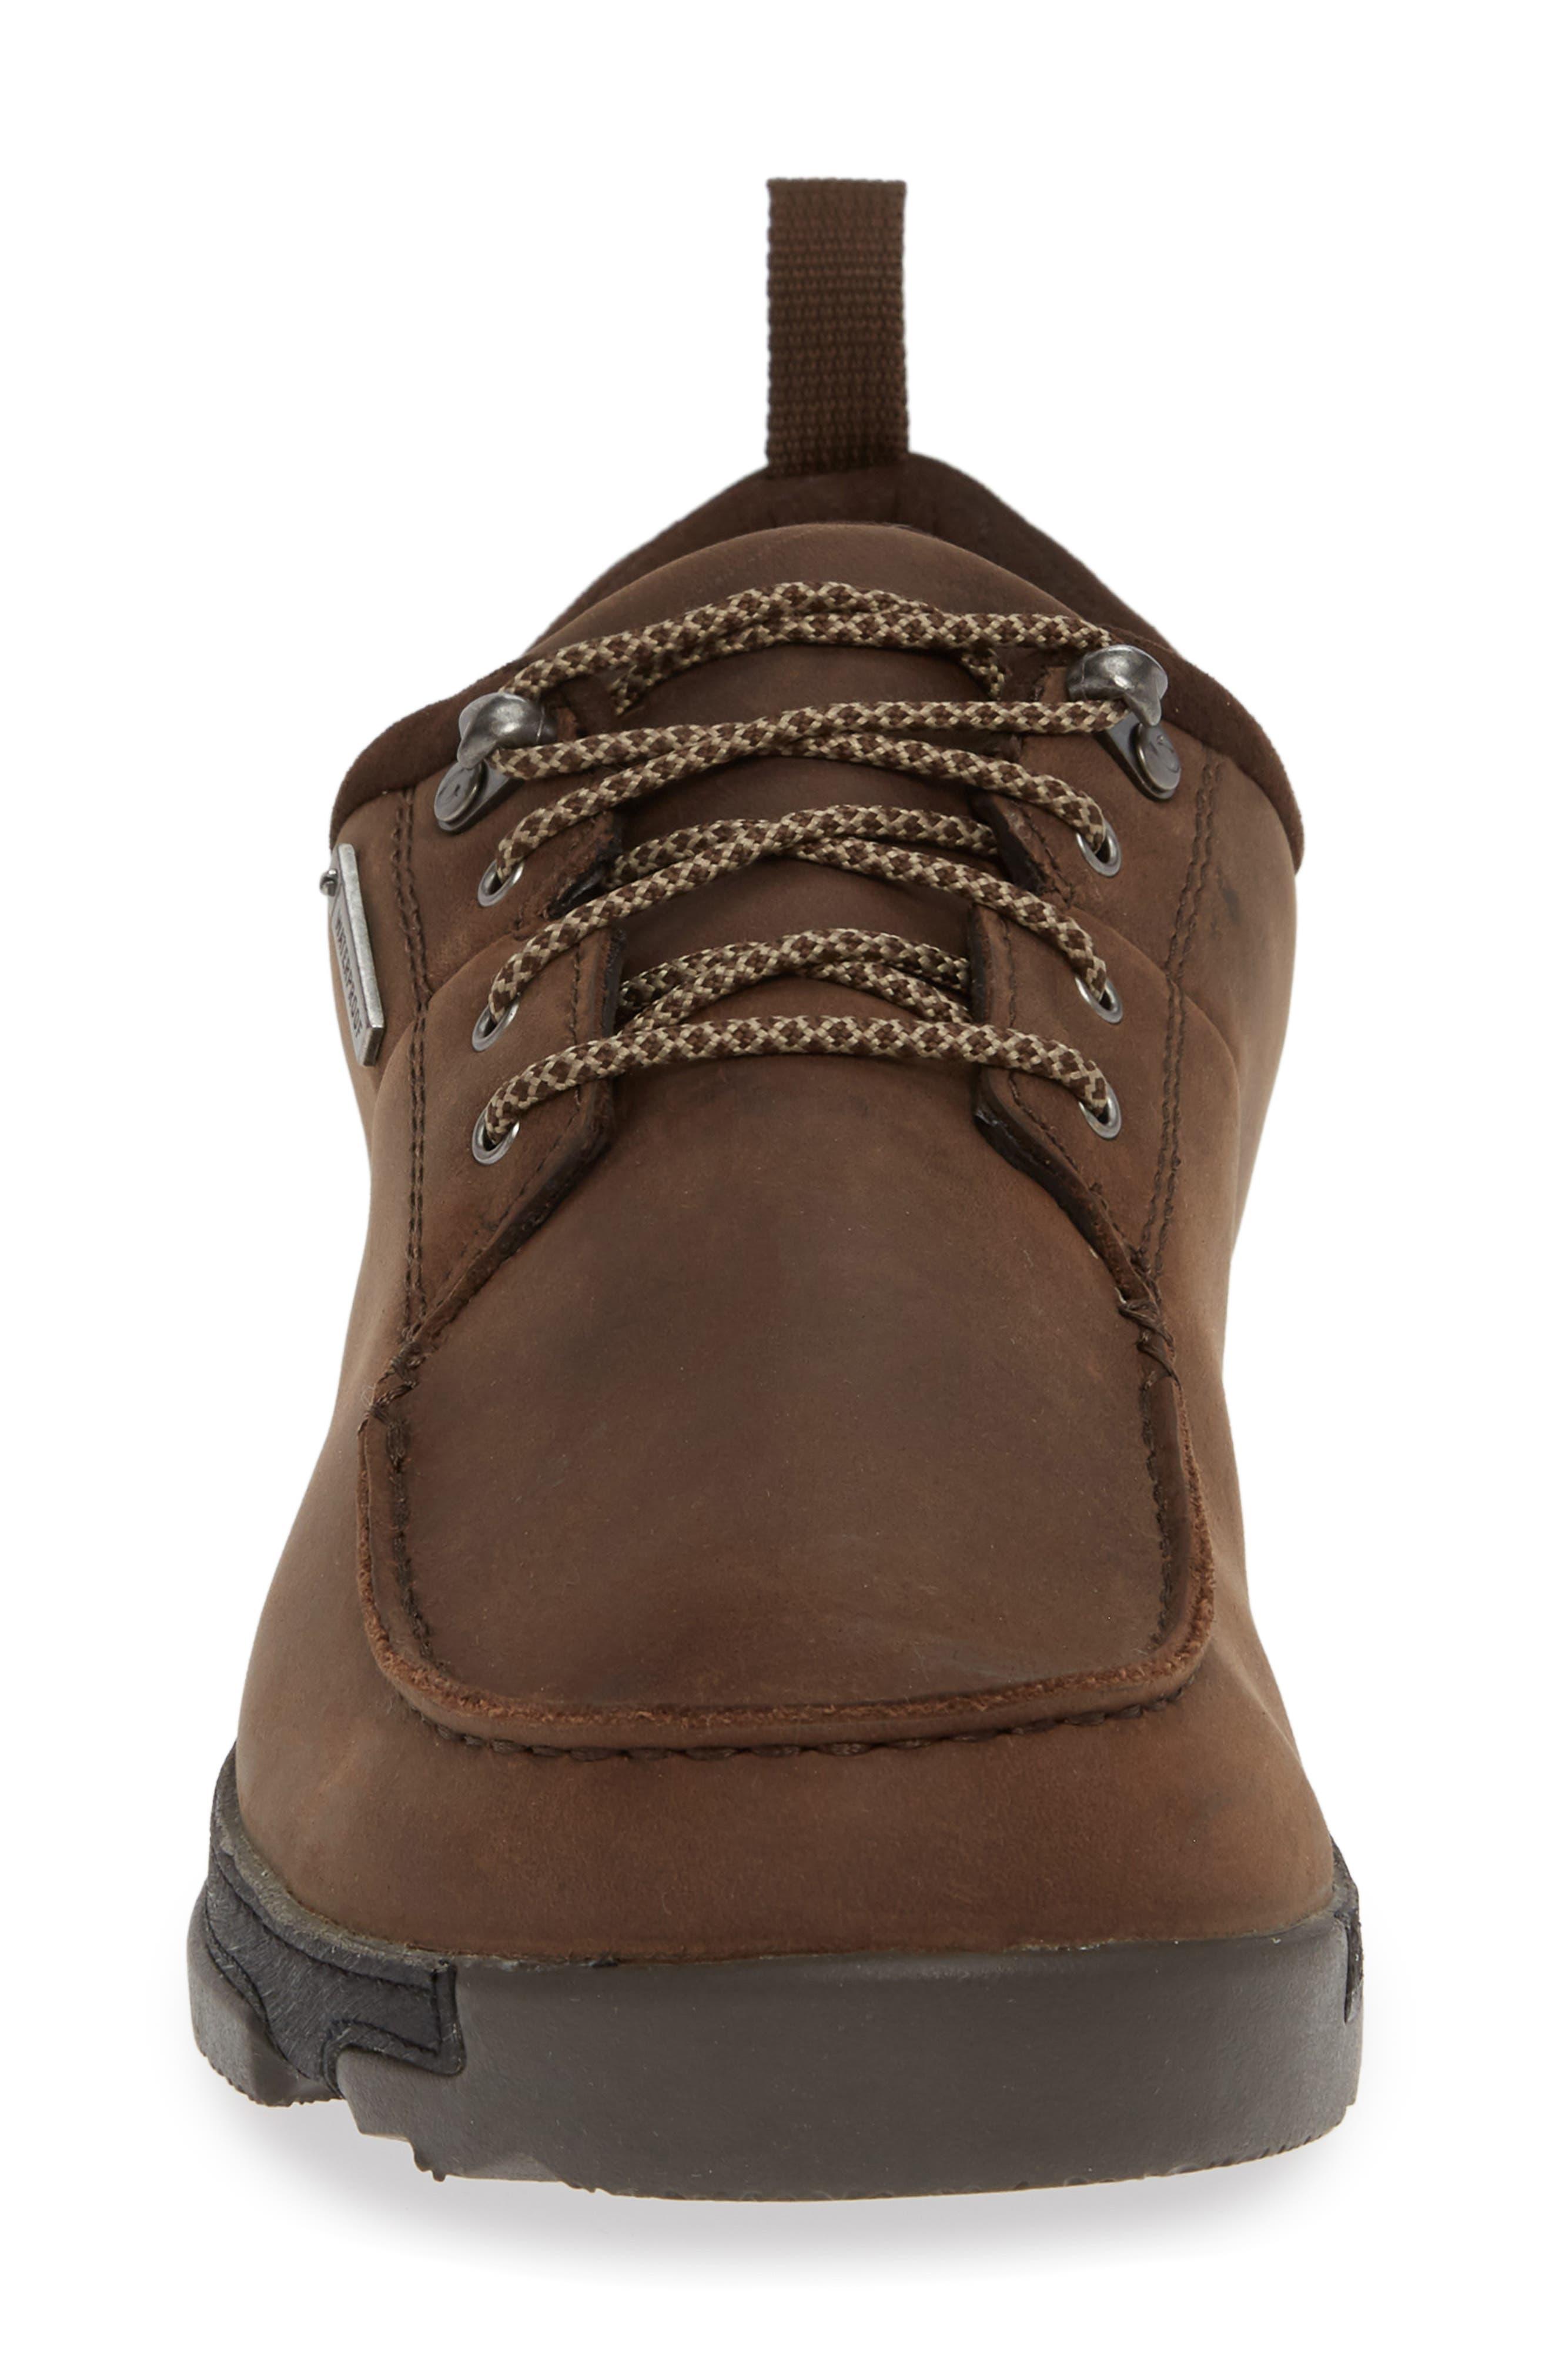 Makoa Waterproof Shoe,                             Alternate thumbnail 4, color,                             ESPRESSO/ BLACK LEATHER